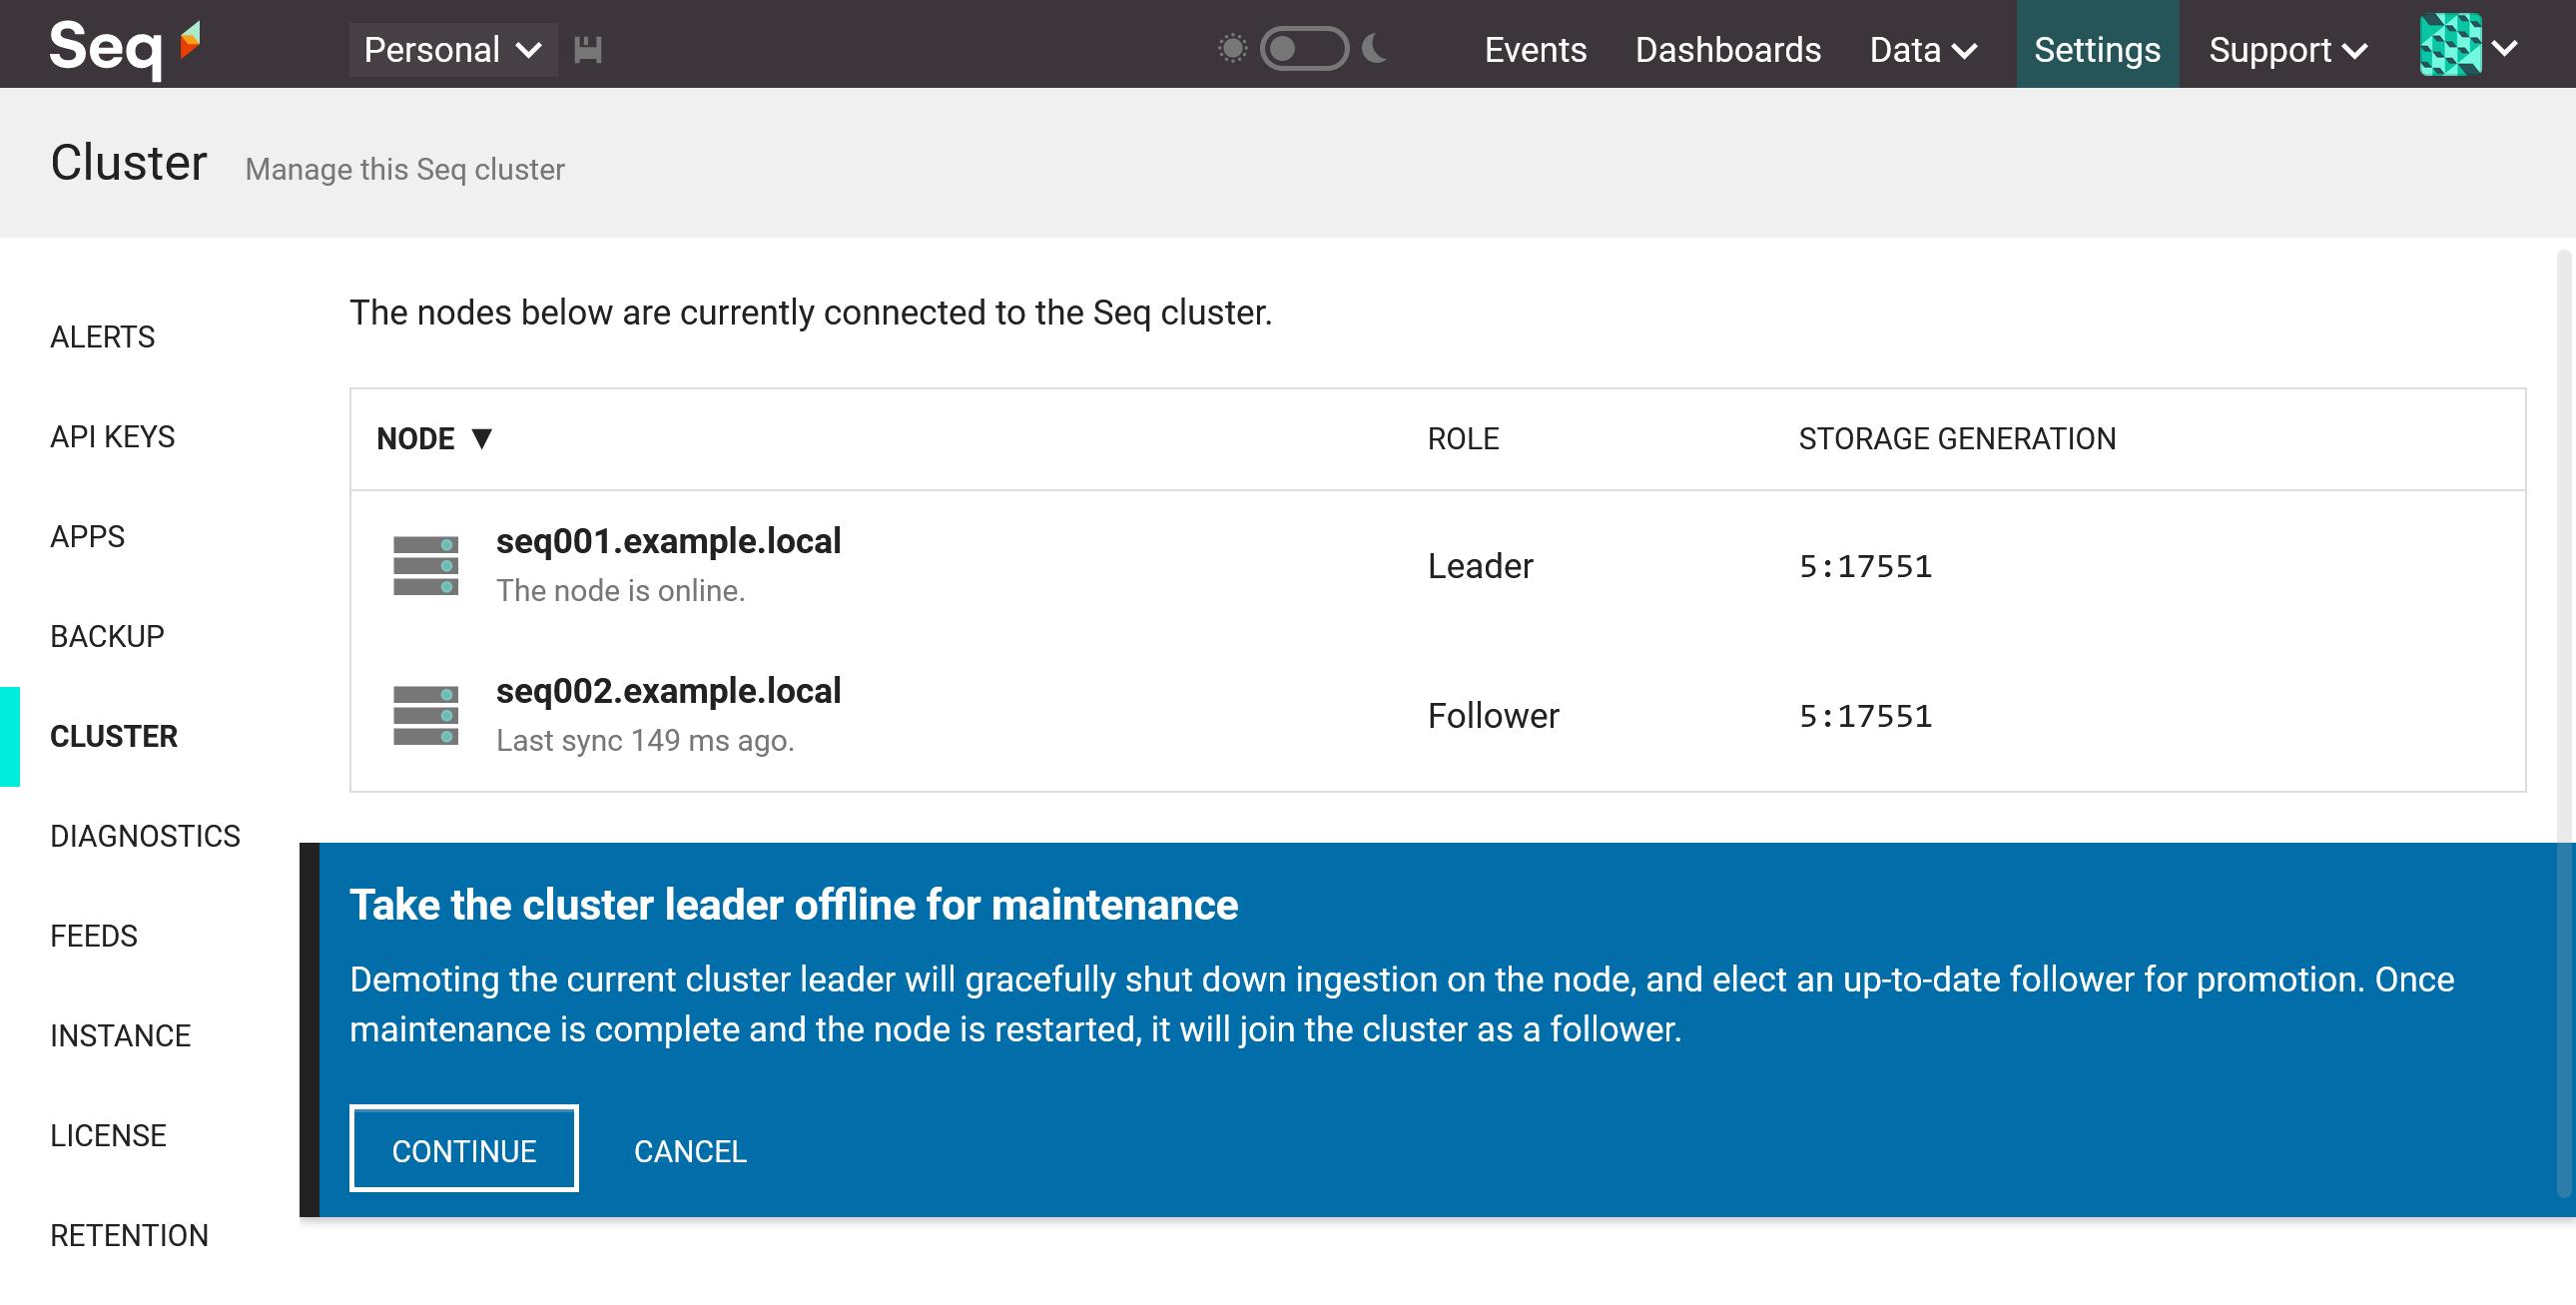 Confirmation when requesting leader node demotion.